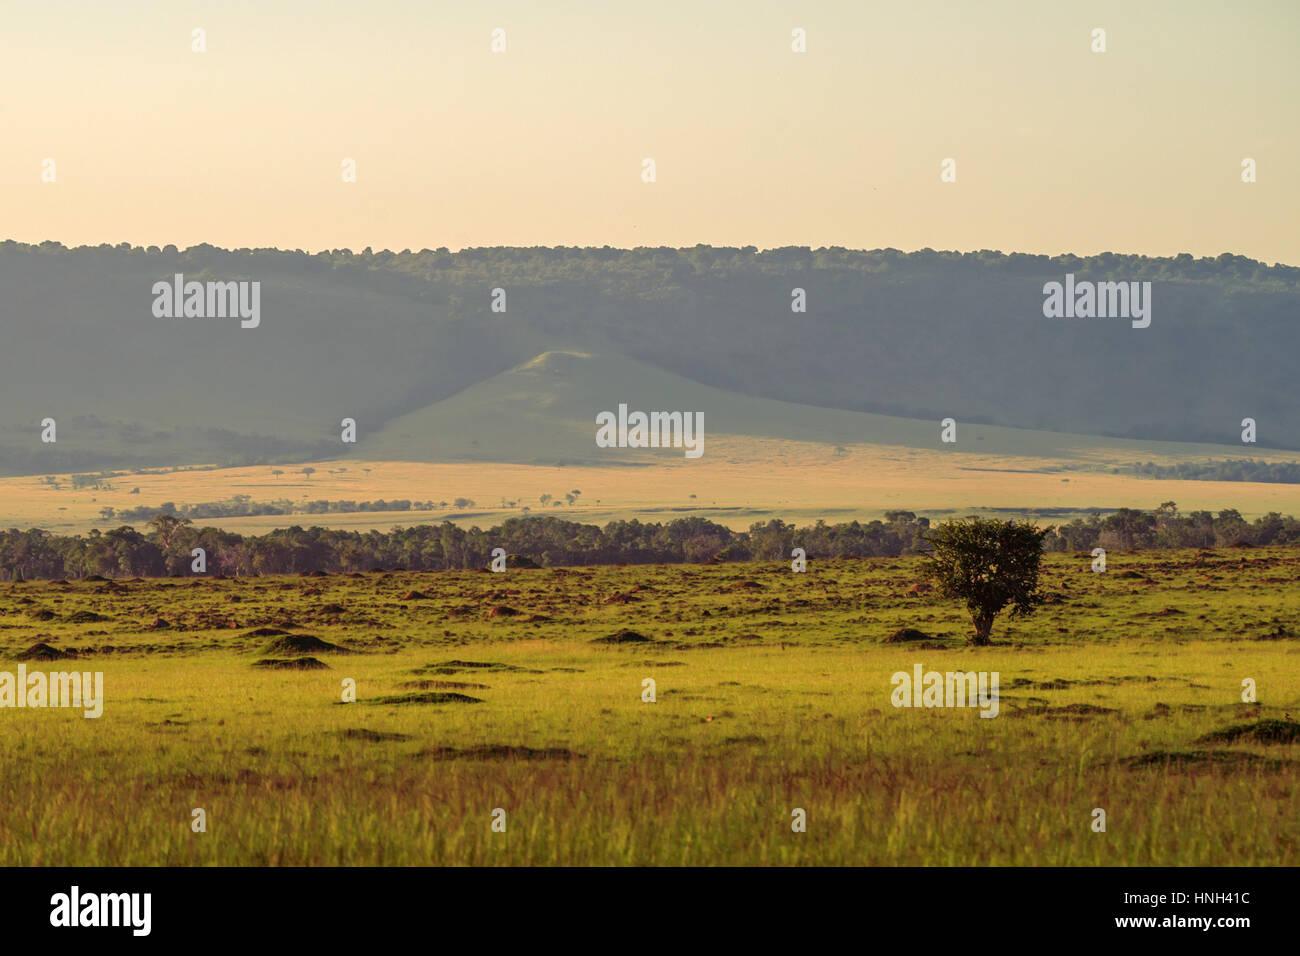 Scenic African savannah landscape in Masai Mara, Kenya - Stock Image